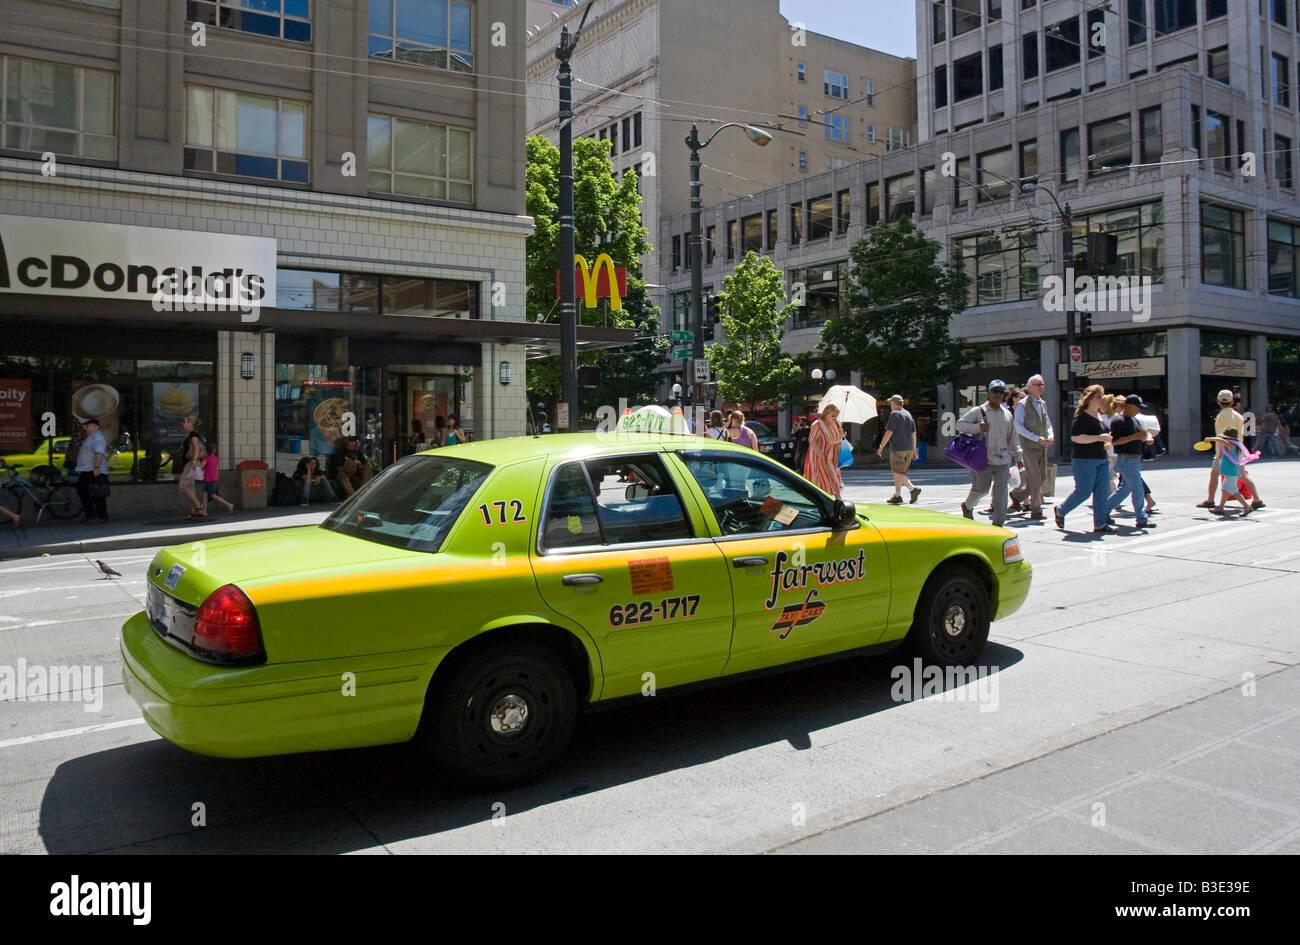 Lime Green Taxicab in sunny Seattle street Washington State WA USA - Stock Image